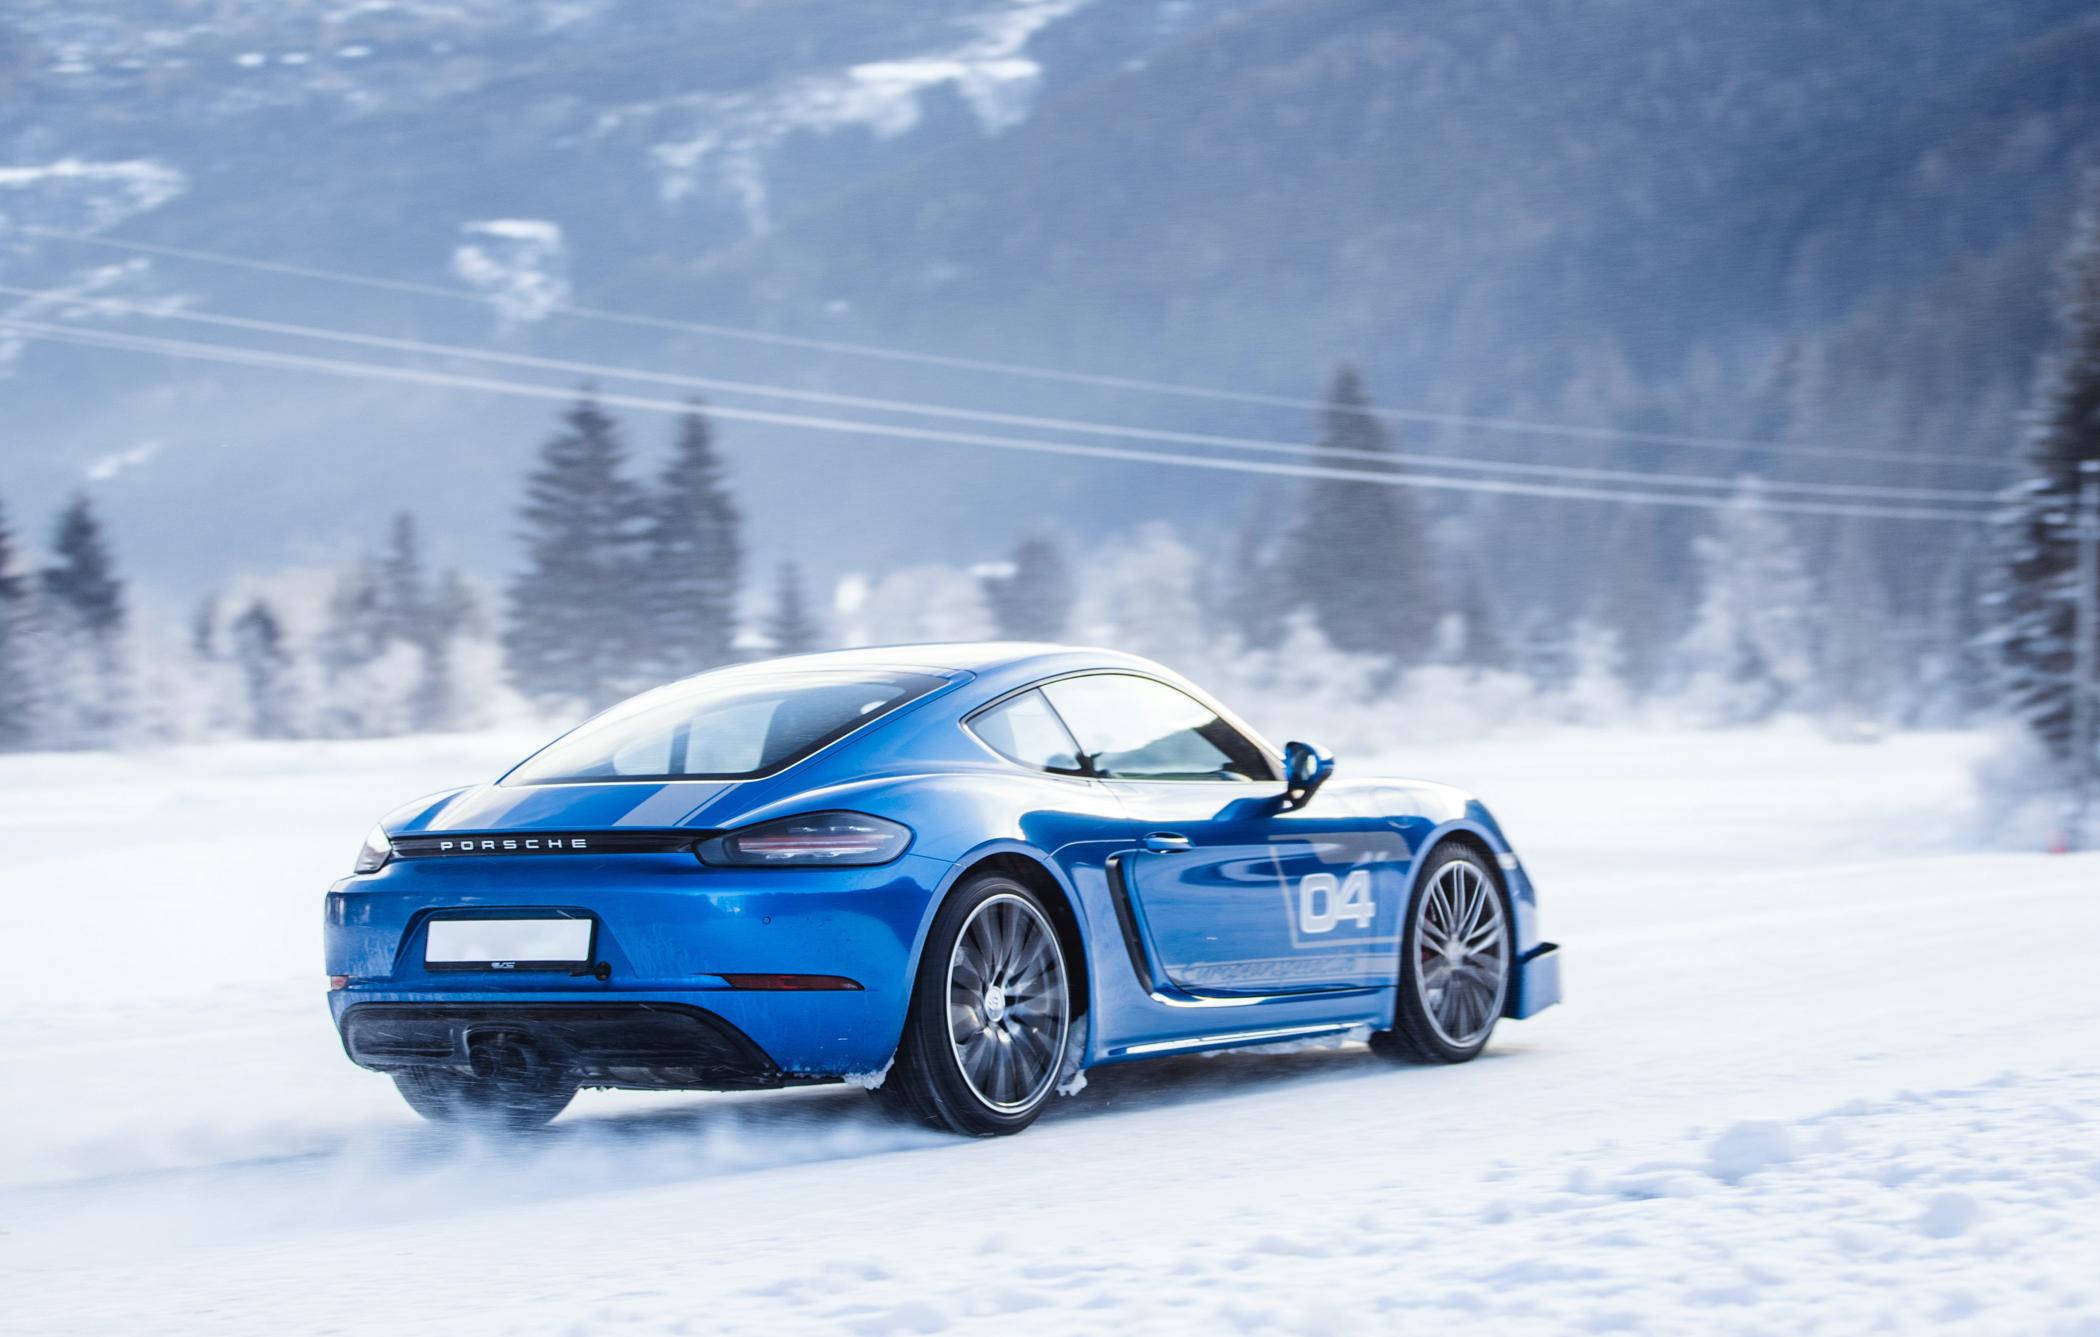 winter-drifttraining-arvidsjaur-bg3